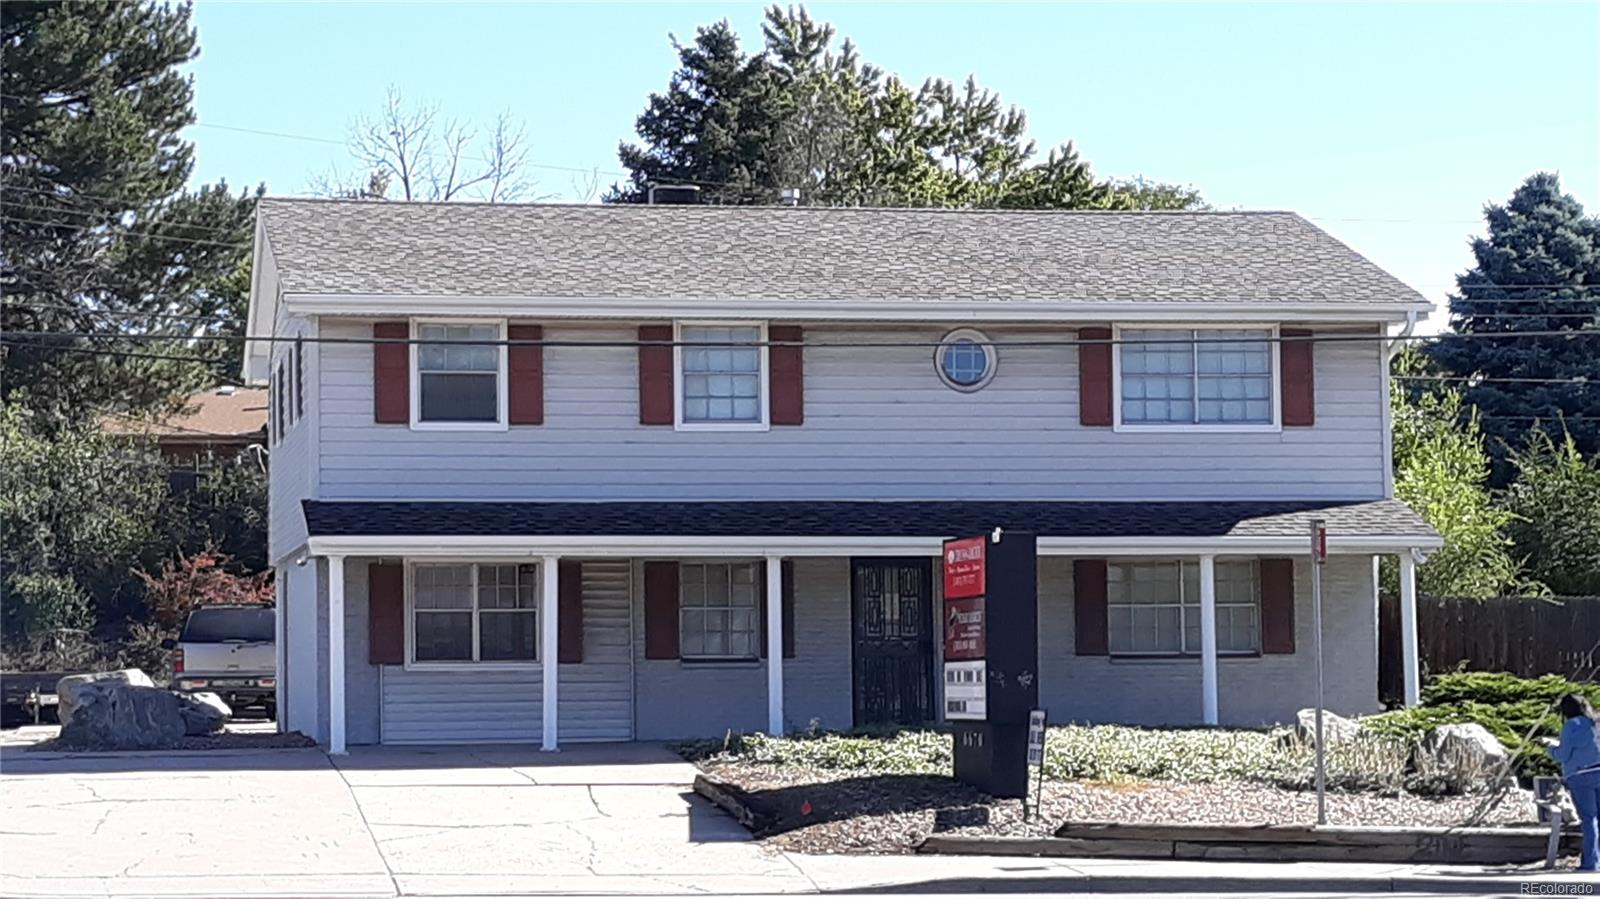 6670 S Broadway, Centennial, CO 80121 - Centennial, CO real estate listing